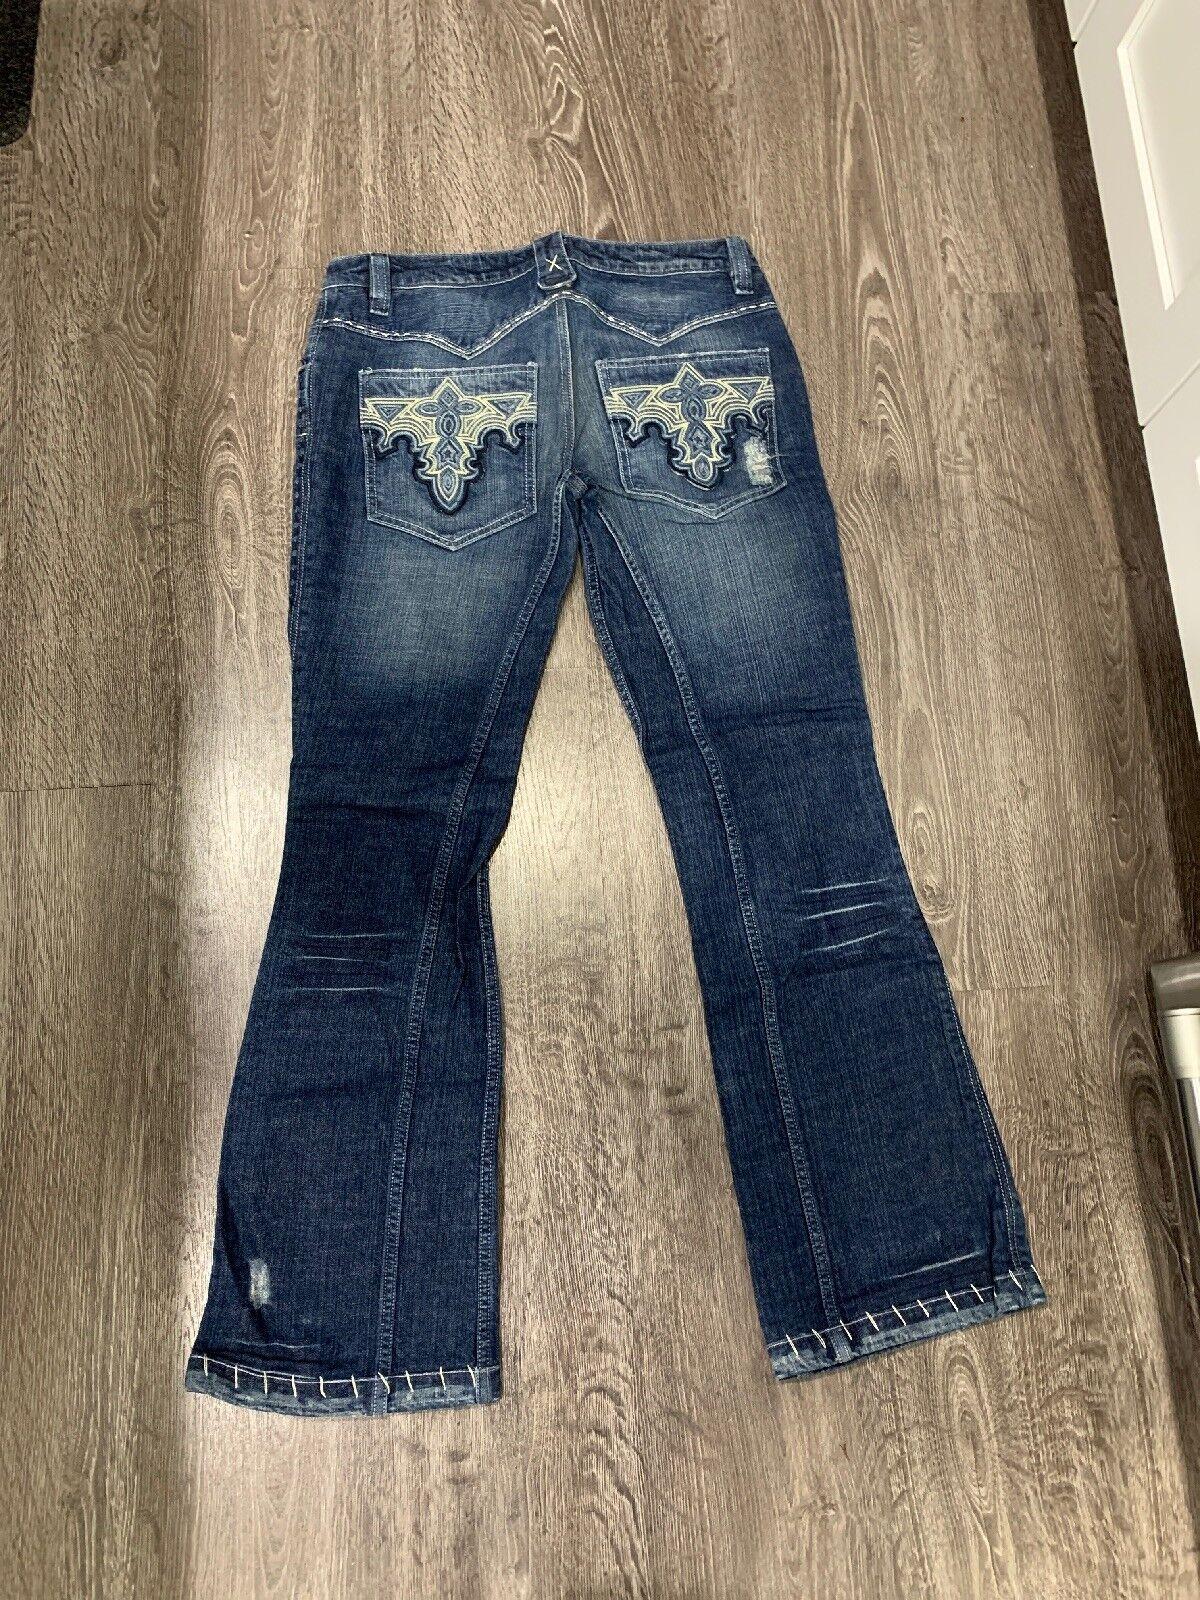 Antik Medium bluee Wash Jeans Embroidery Women Size 32 EUC